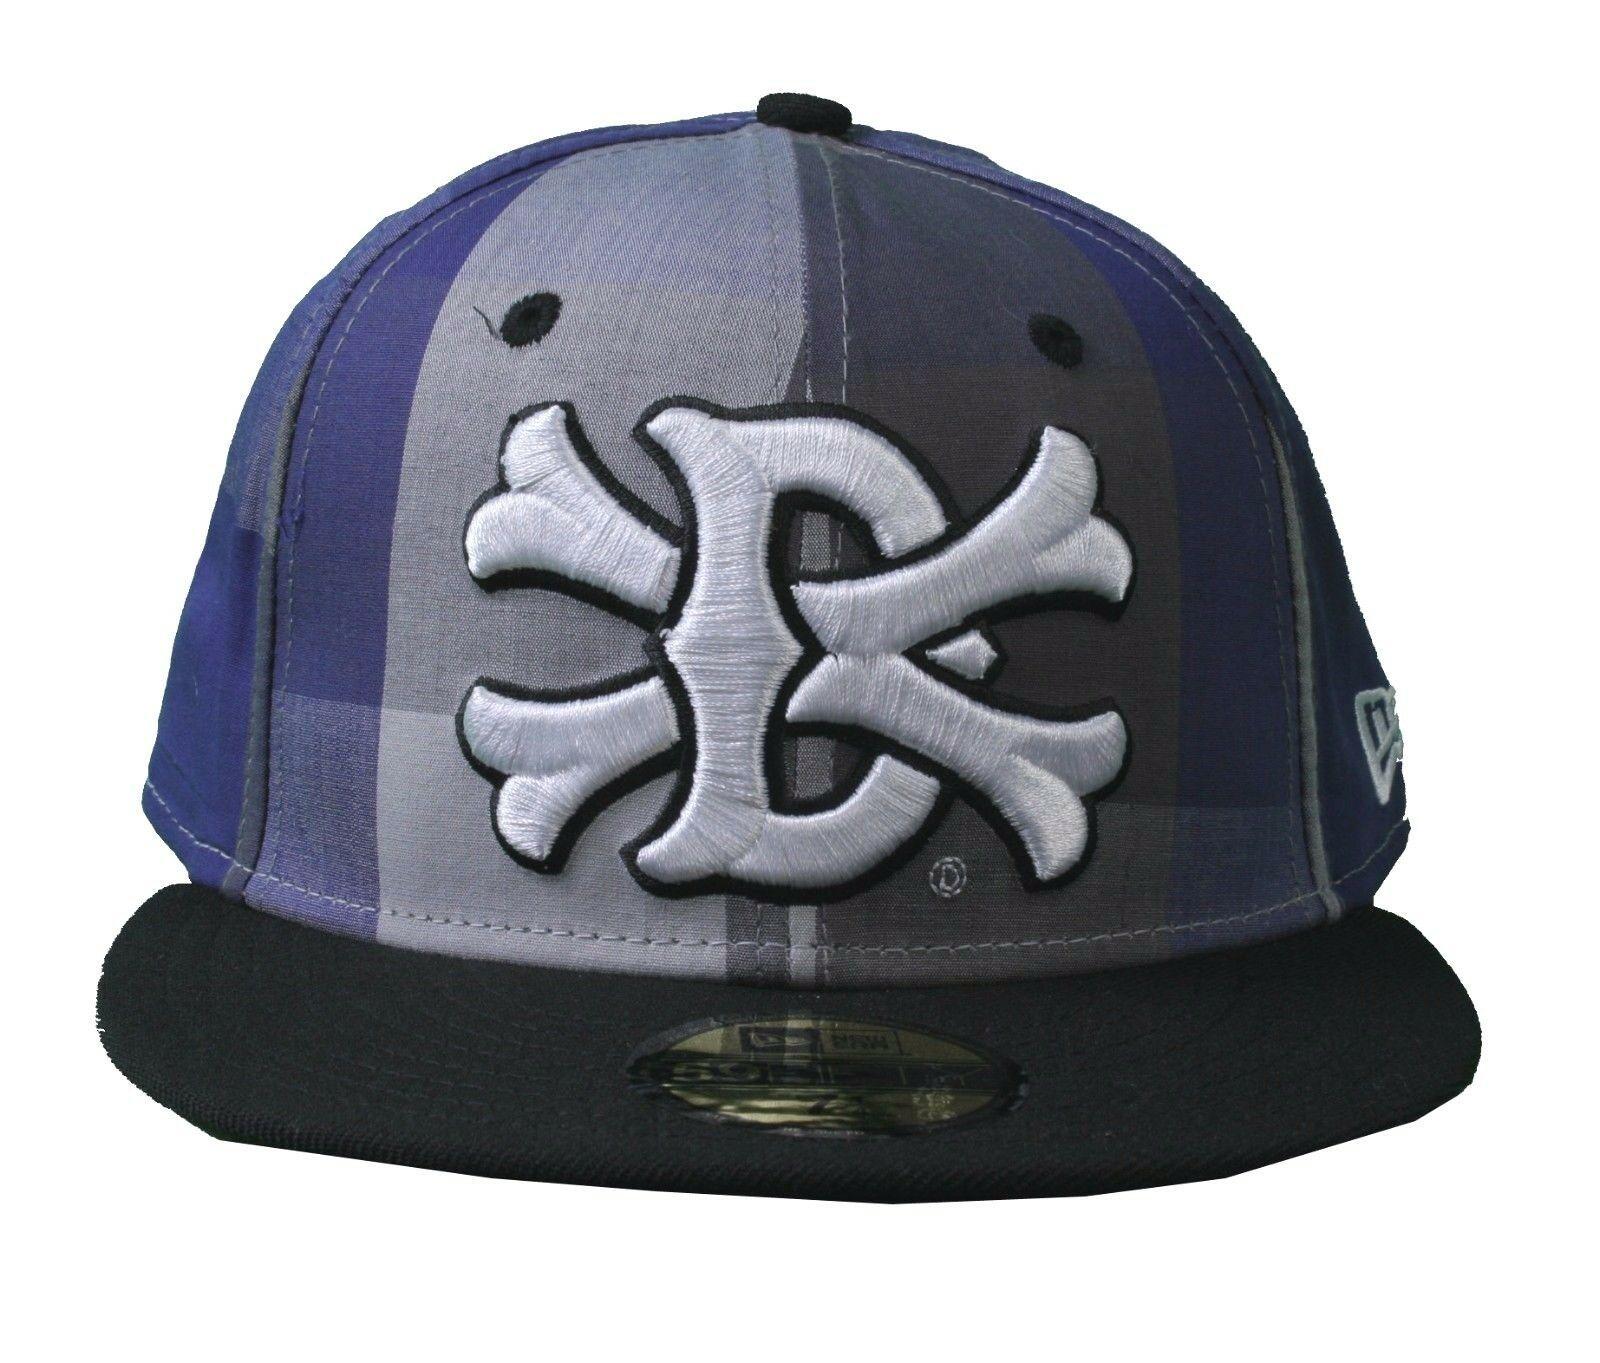 Dissizit Dx11 Ossa Percalle Blu & Nero NEW ERA 59FIFTY Aderente Baseball Hat Nwt